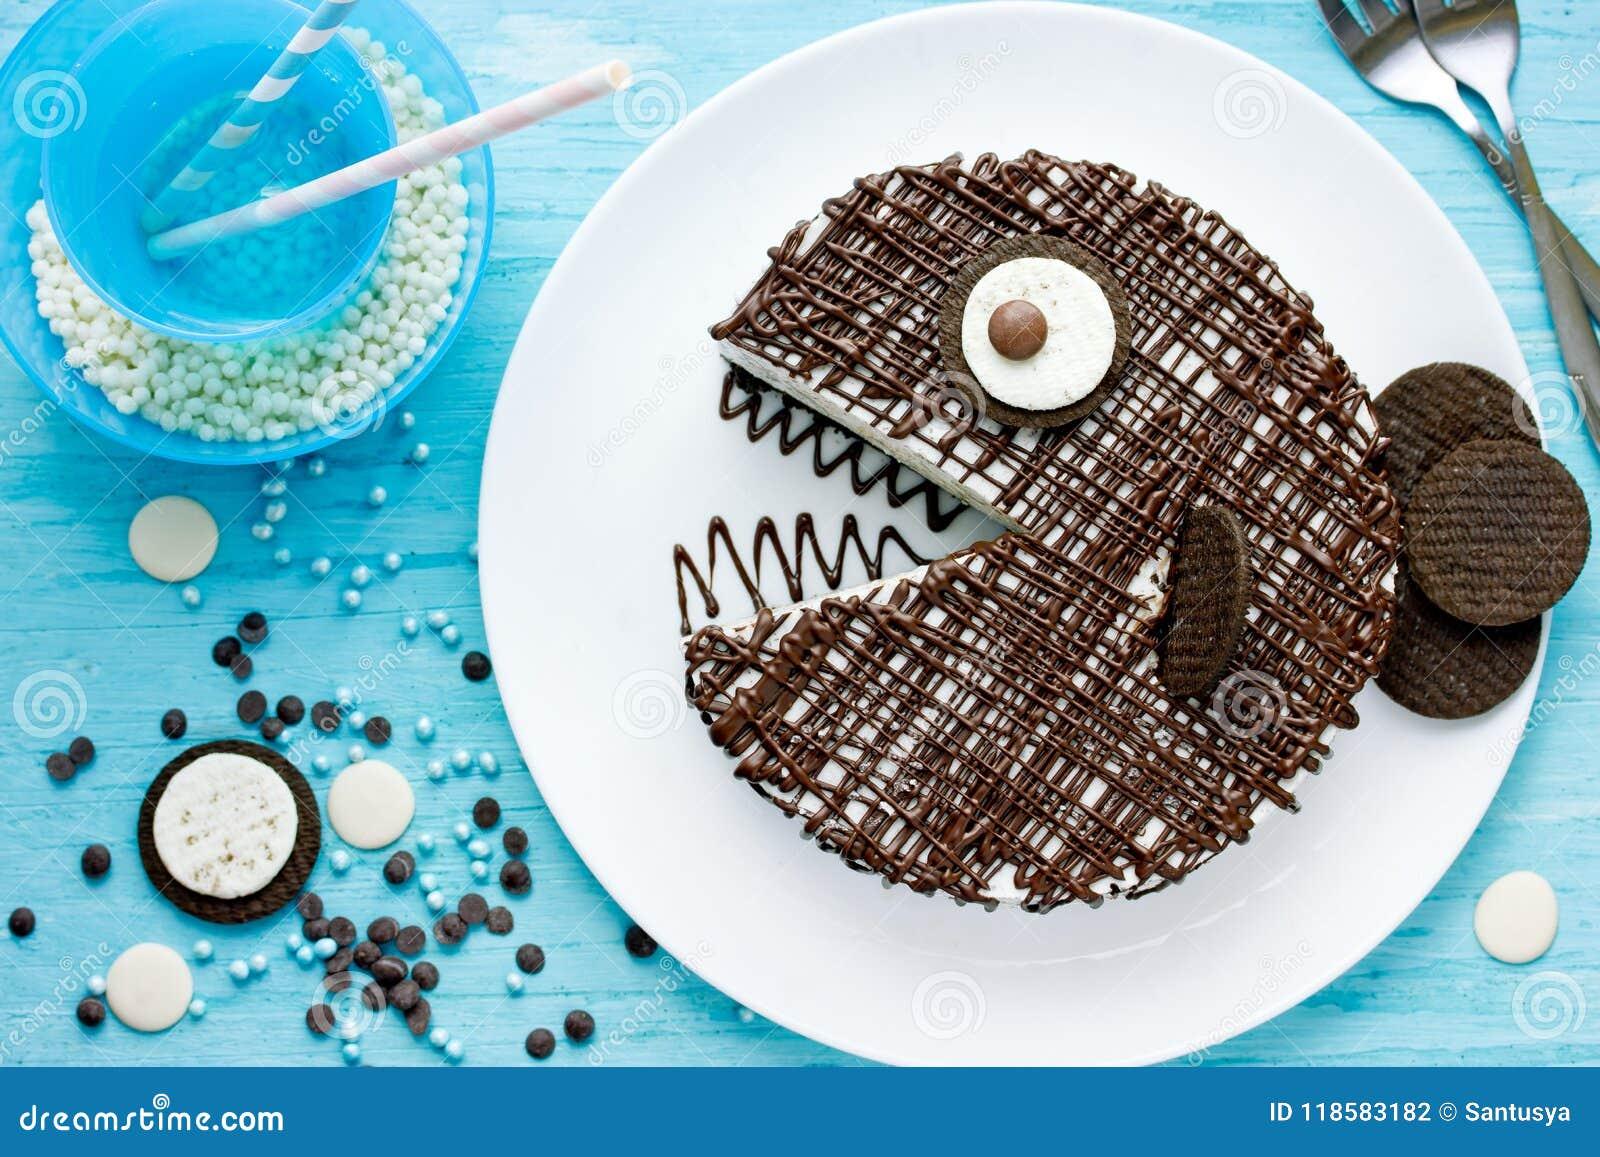 Groovy Creative Birthday Cake For Kids Chocolate Fish Cake Stock Photo Funny Birthday Cards Online Overcheapnameinfo